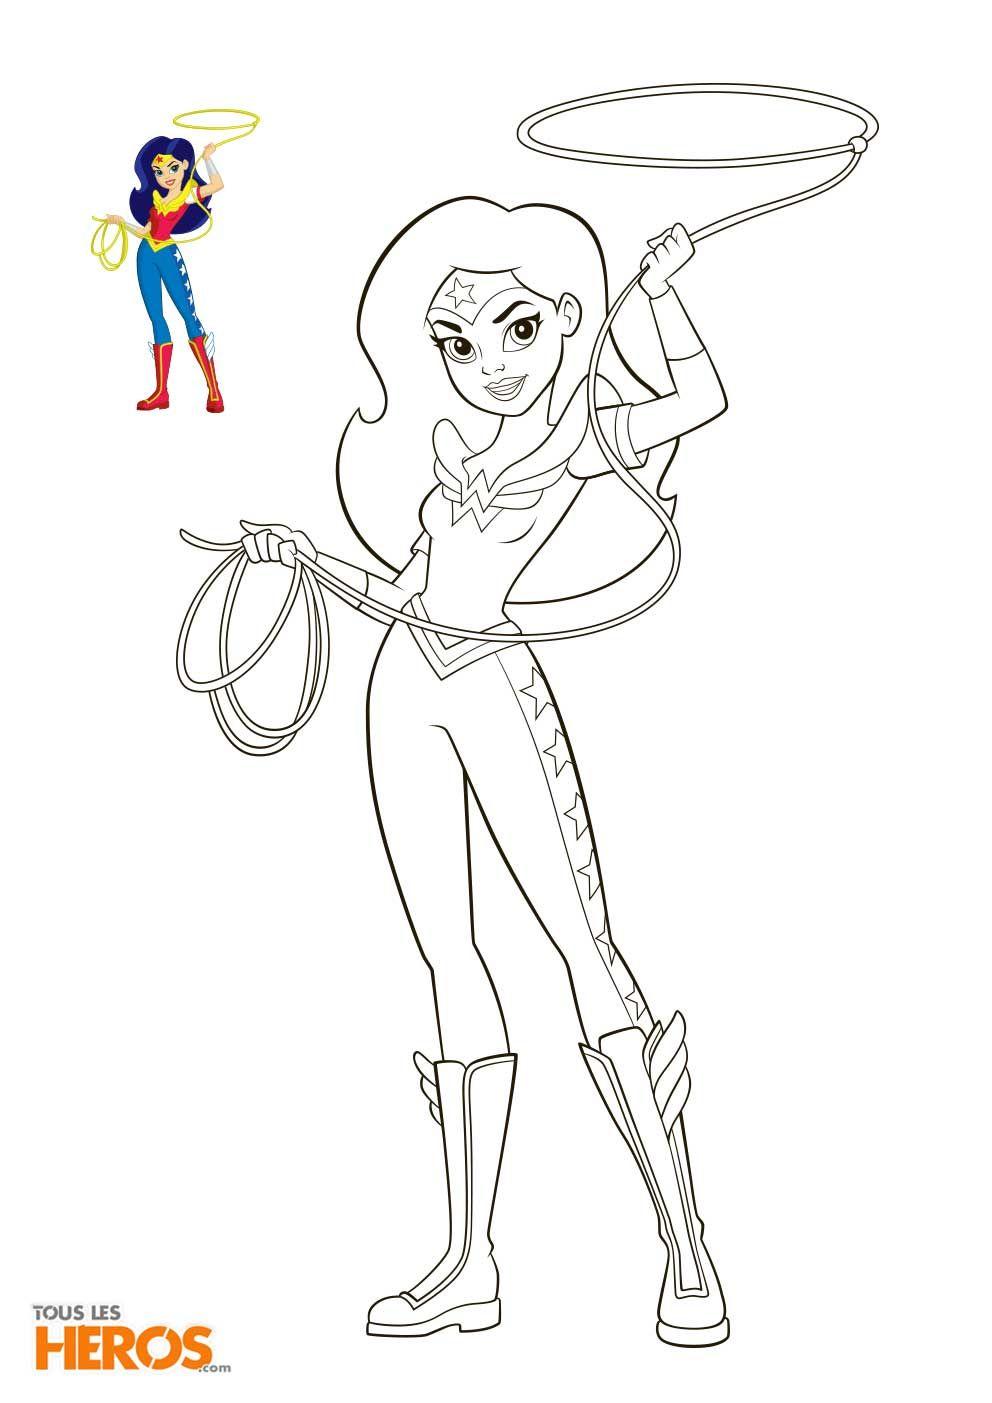 Coloriage Dc Super Hero Girls5 Jpg 992 1403 Coloriage Super Heros Coloriage Coloriage Ladybug